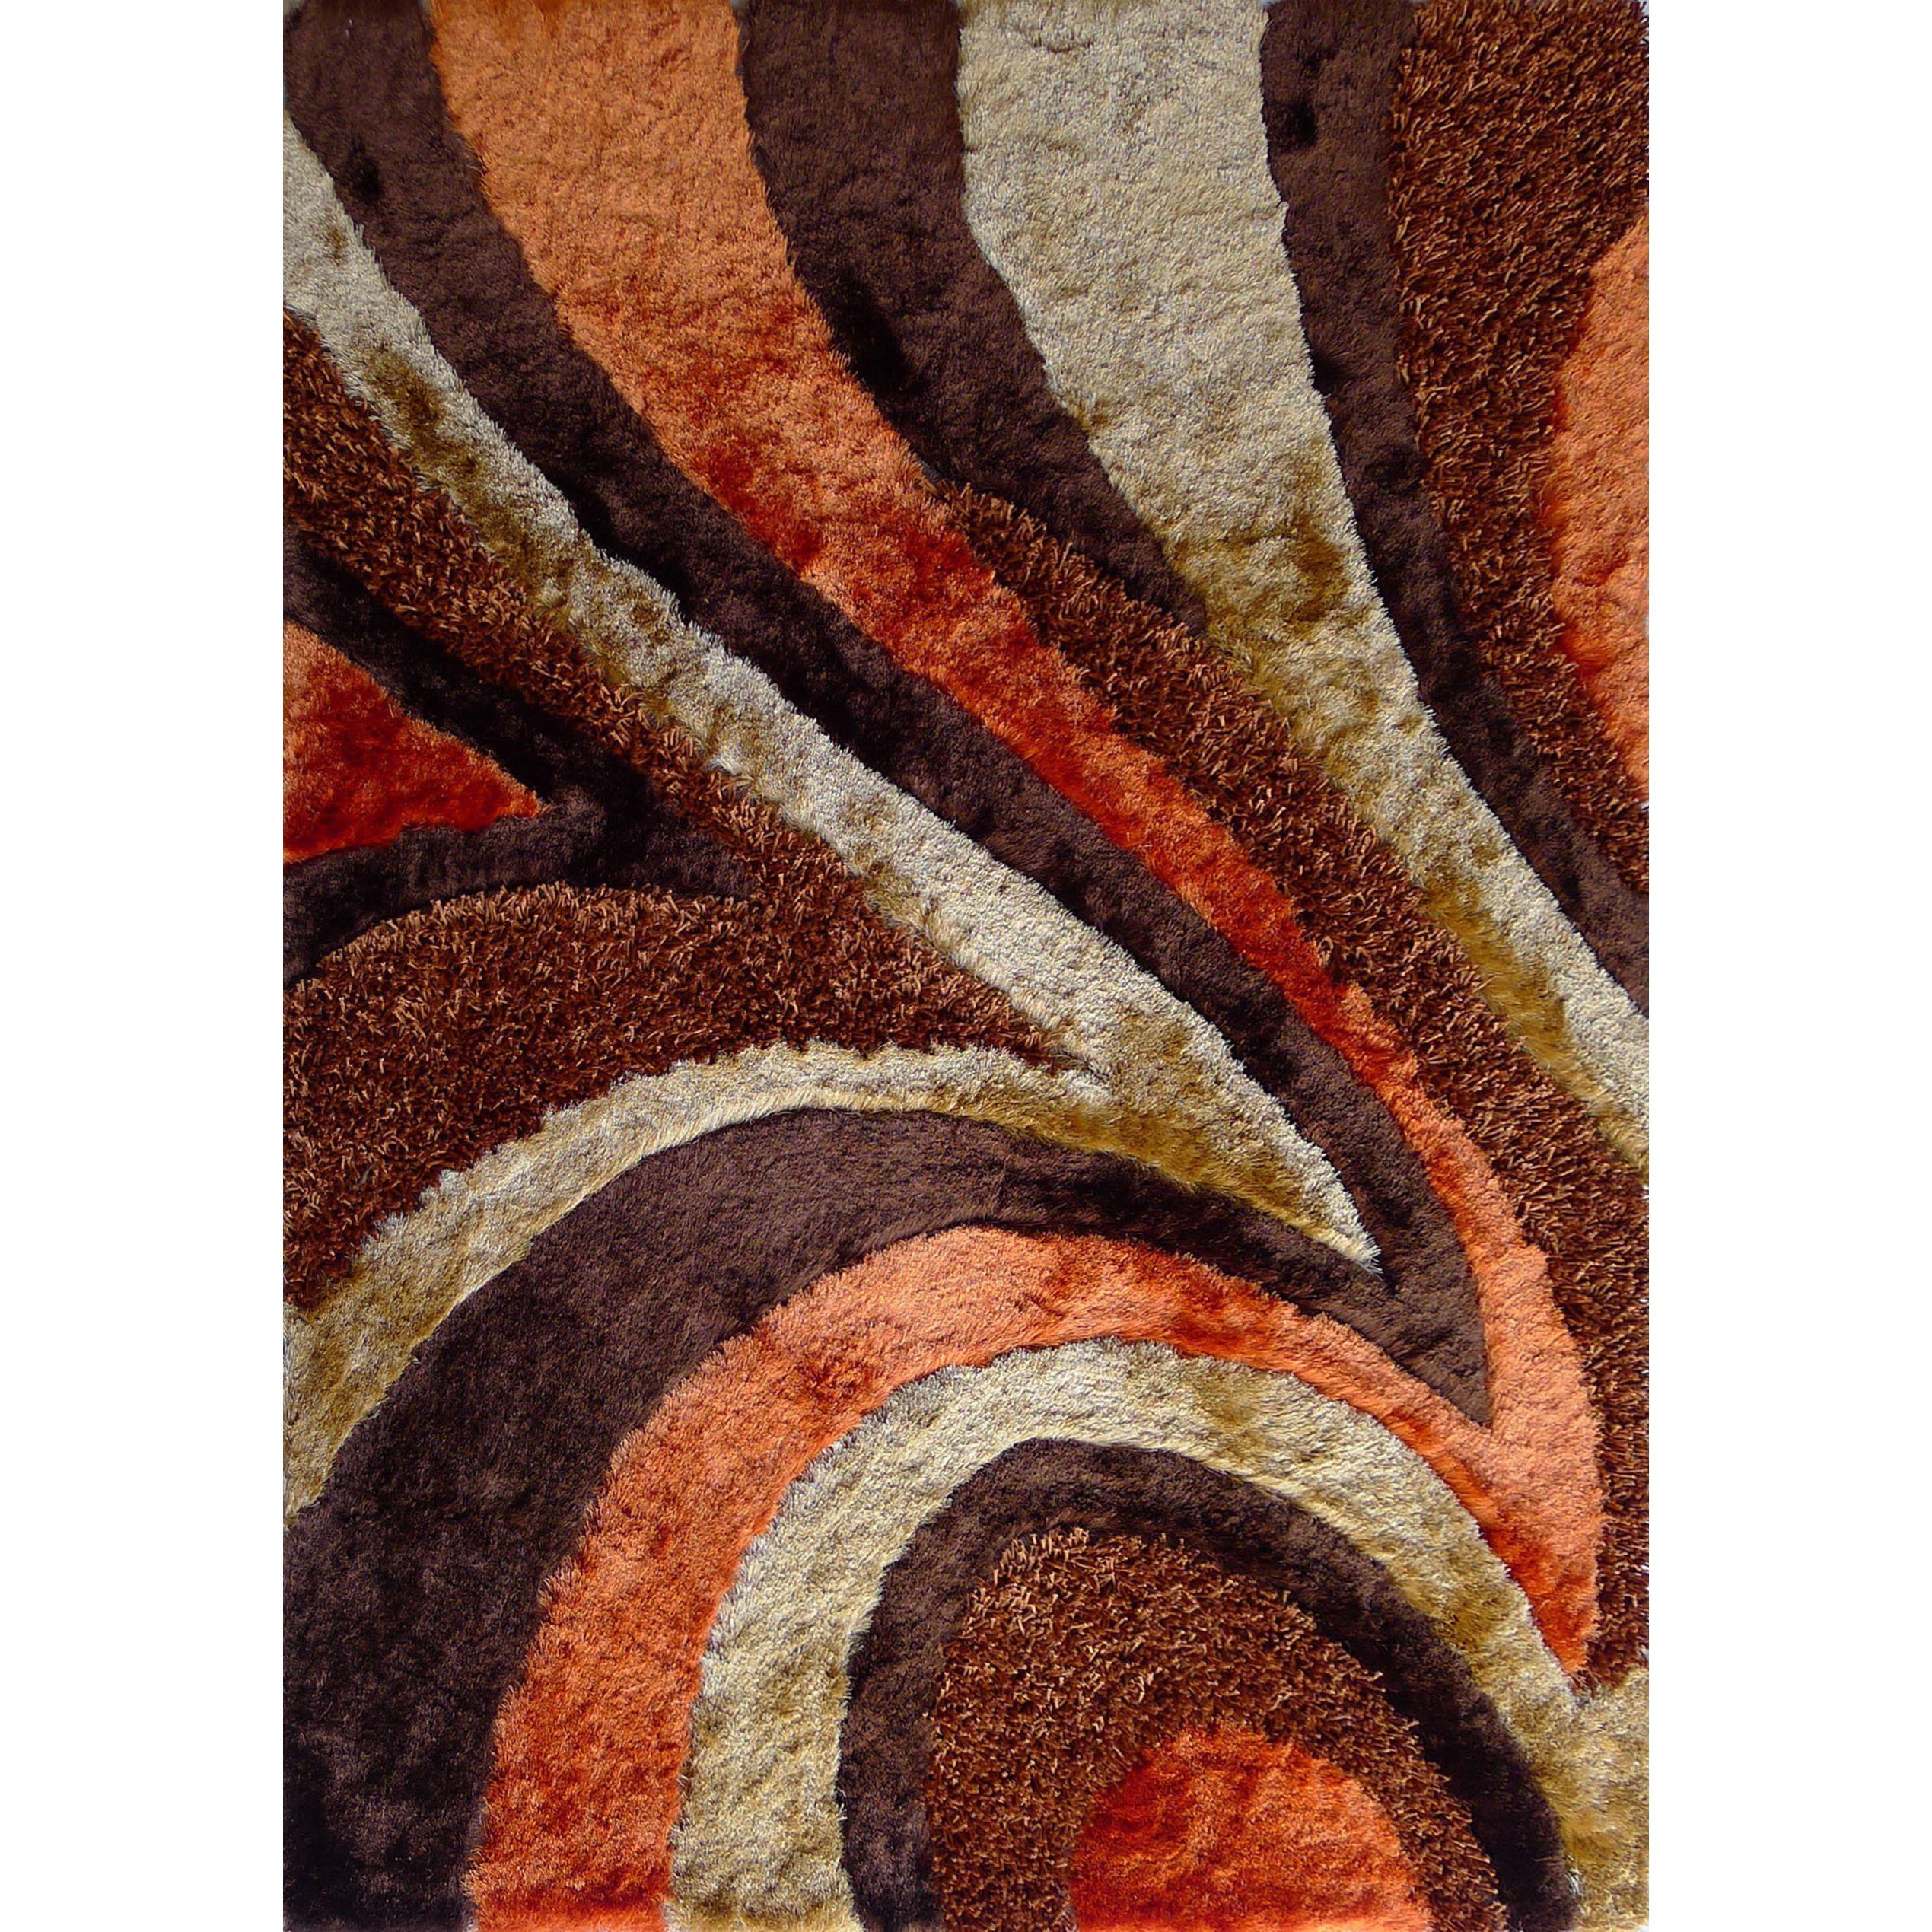 Beige Brown Orange Polyester Geometric Shag Area Rug 5 X 7